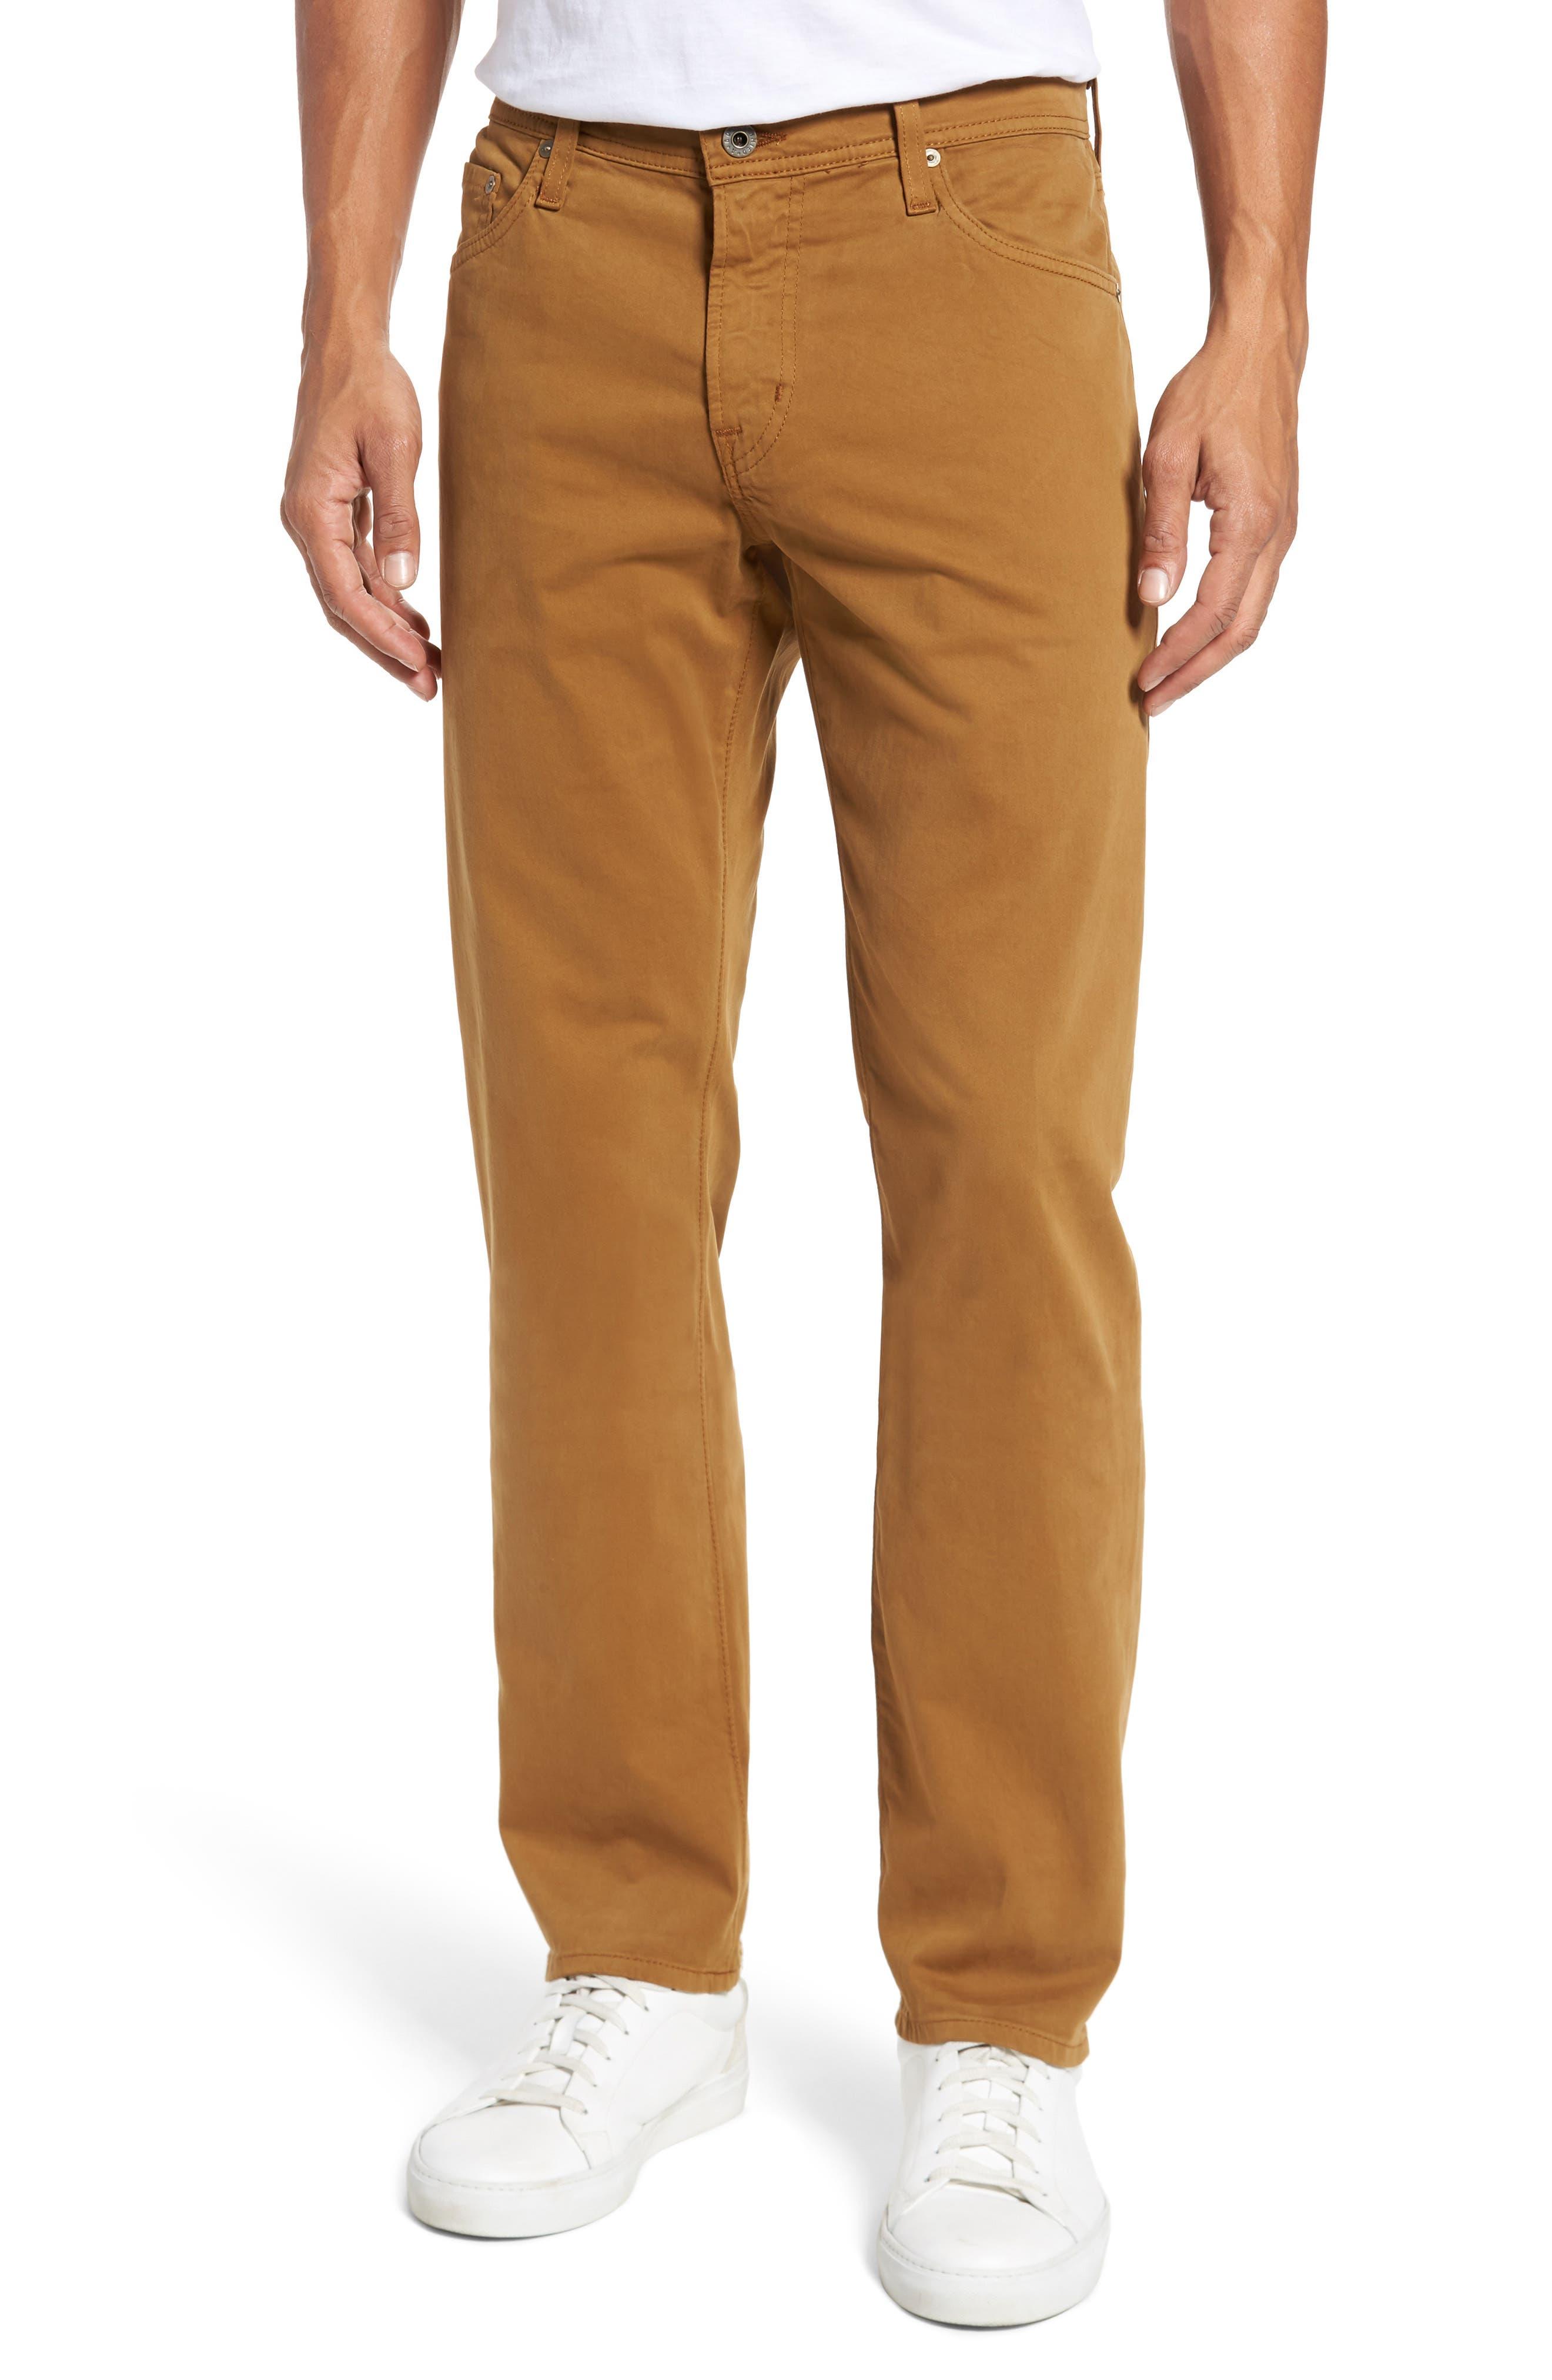 Graduate SUD Slim Straight Leg Pants,                         Main,                         color, Burnt Saffron (Bfn)